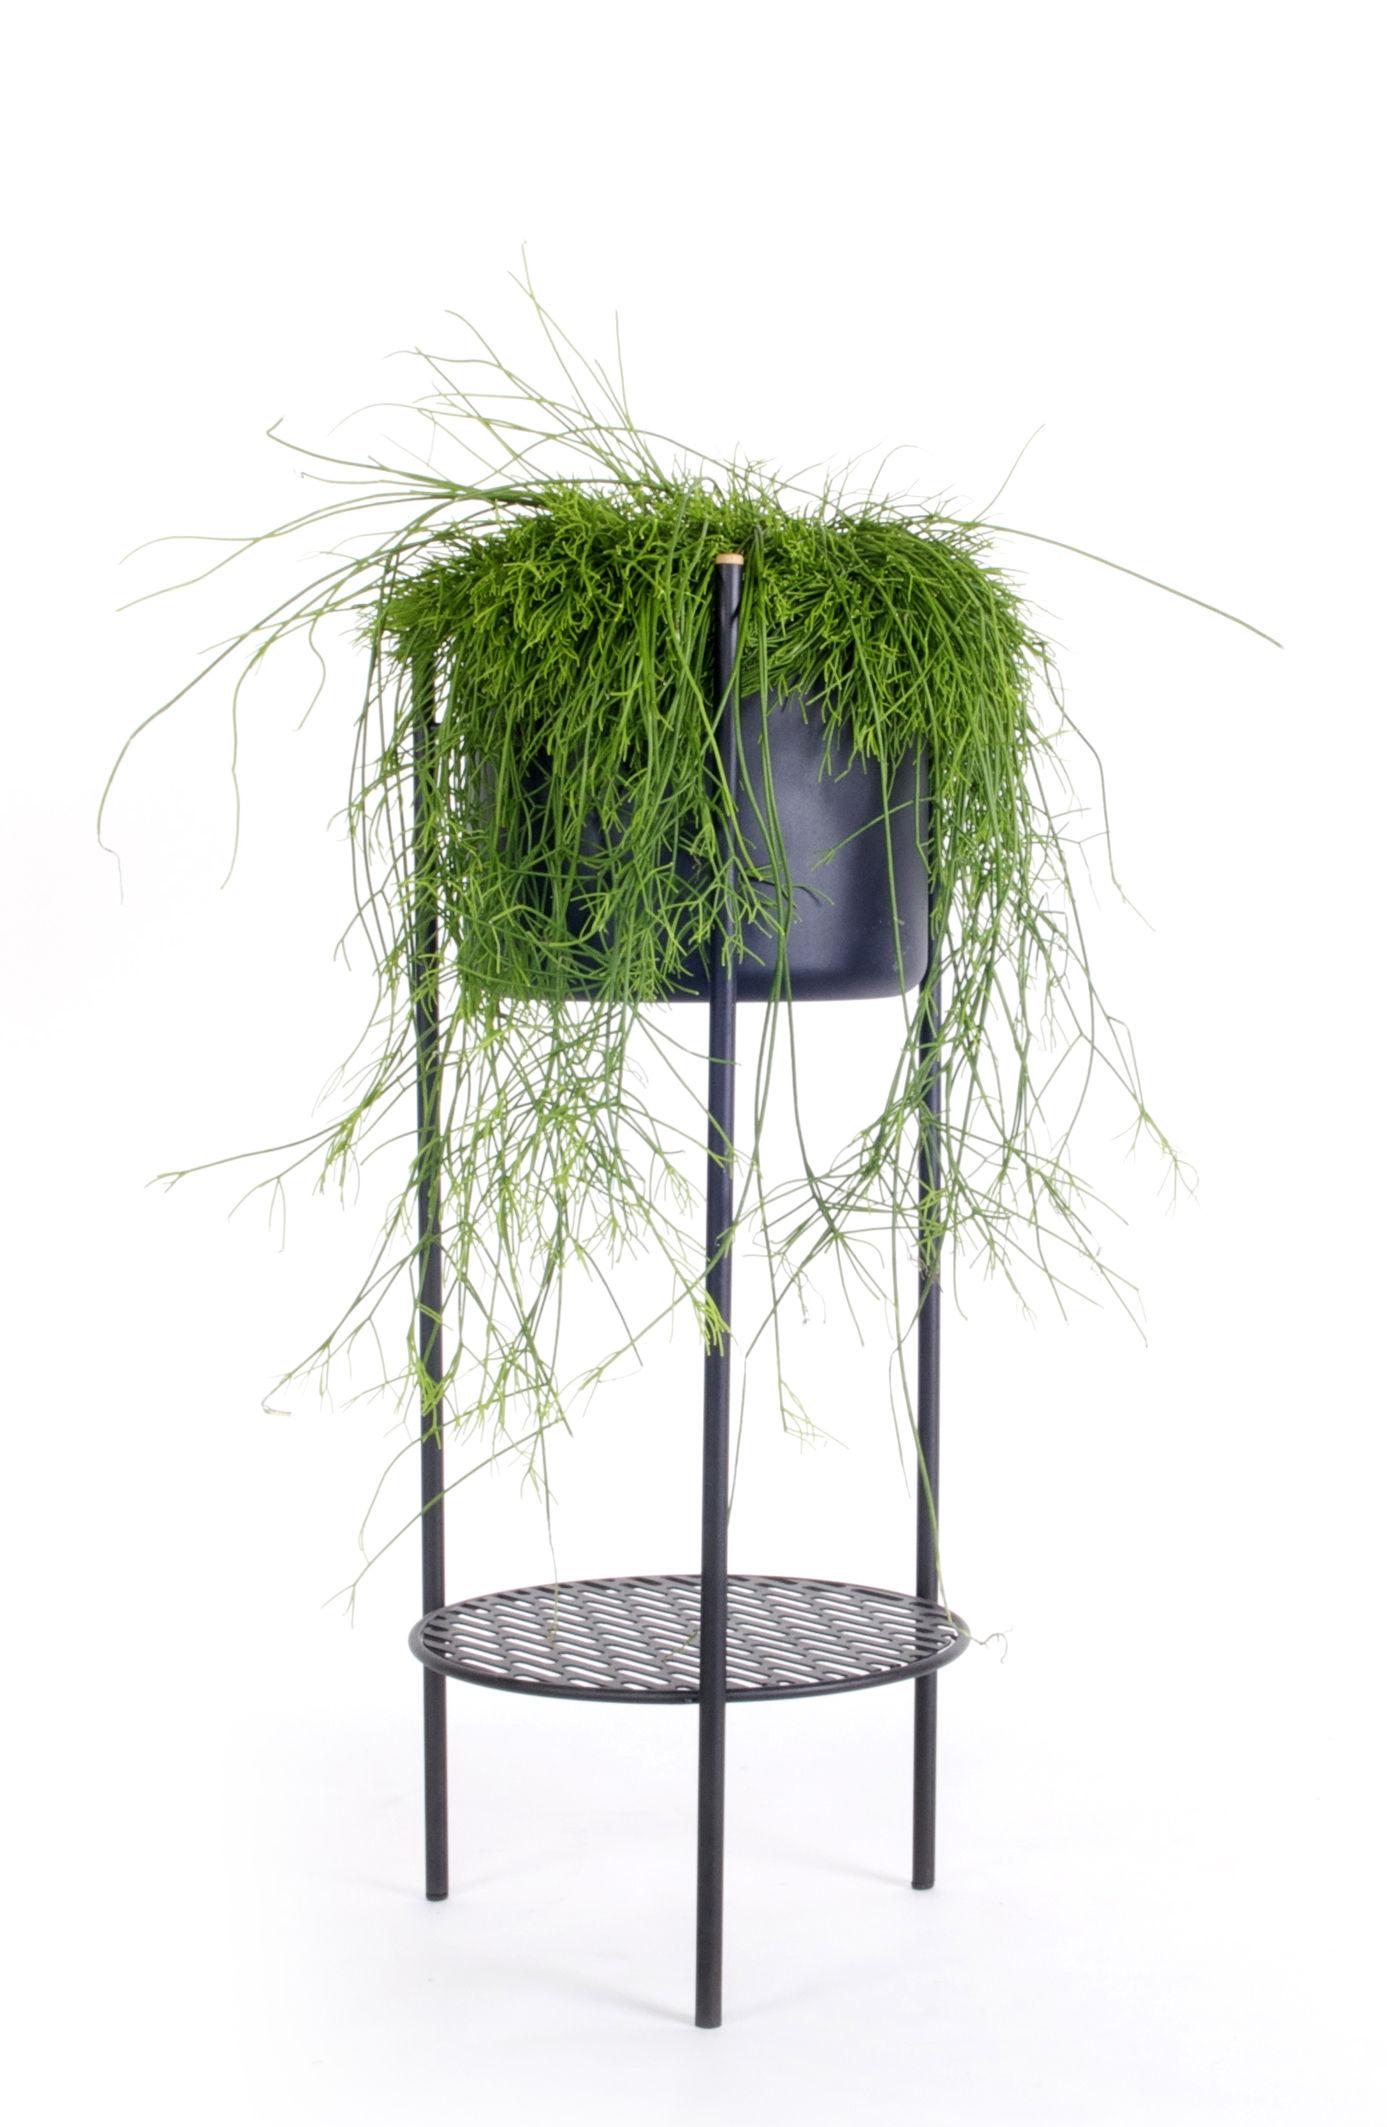 Outdoor - Vasi e Piante - Vaso di fiori Ent Medium / H 78 cm - Metallo - XL Boom - H 78 cm / Nero - Acier laqué époxy